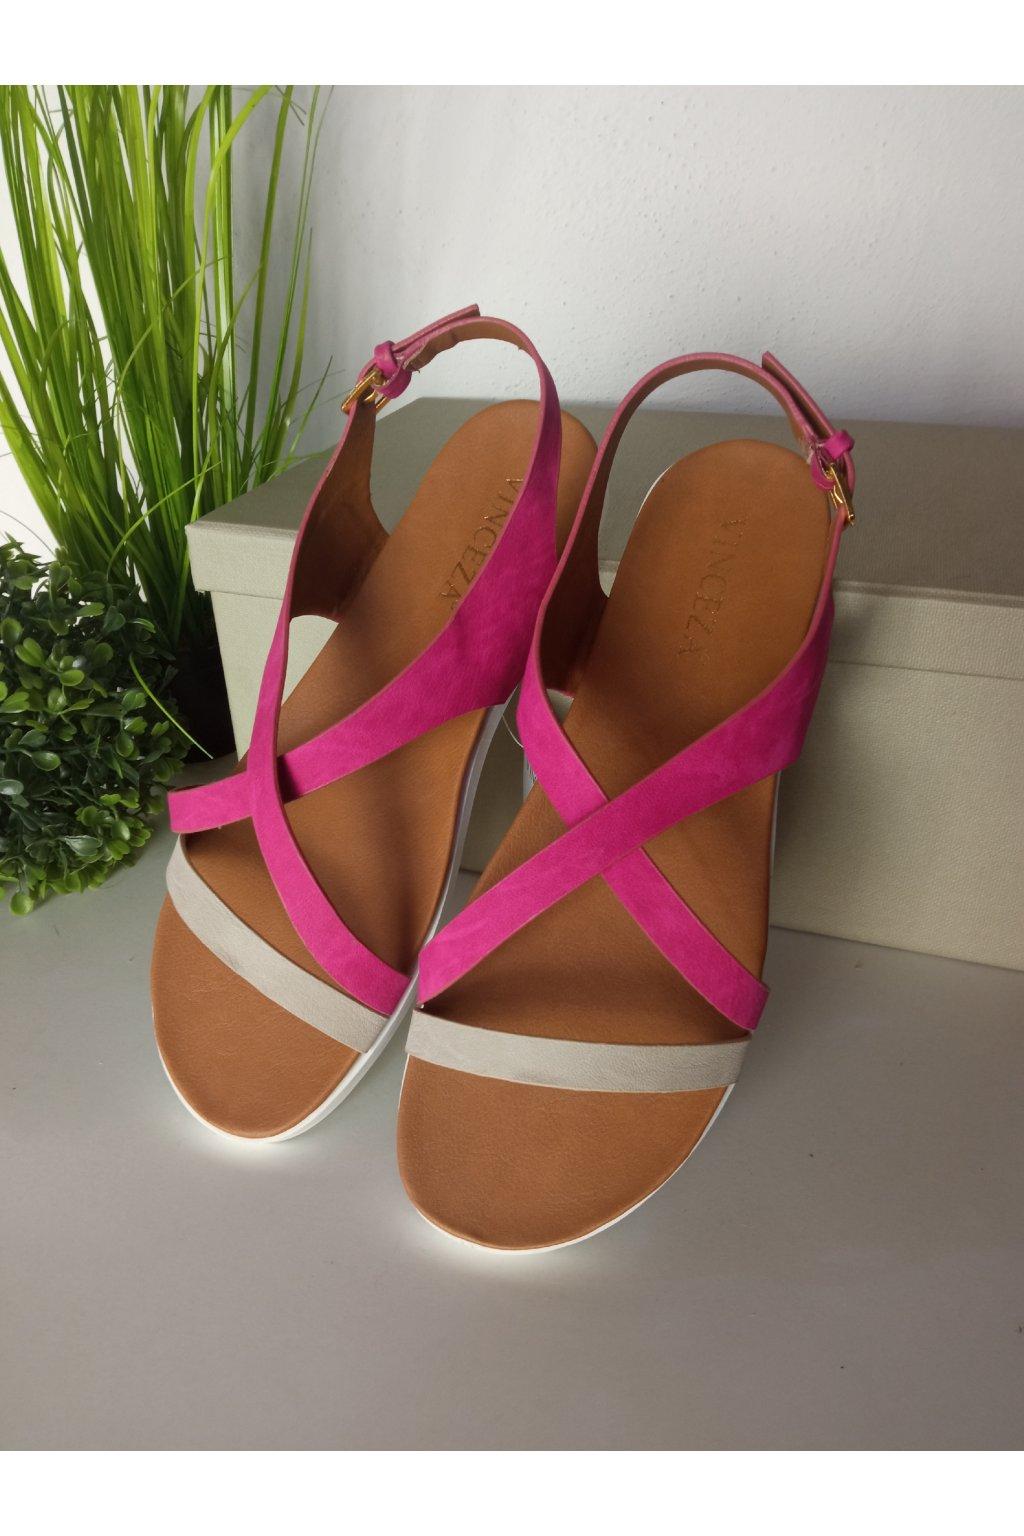 Ružové sandále NJSK JOL17-9910P